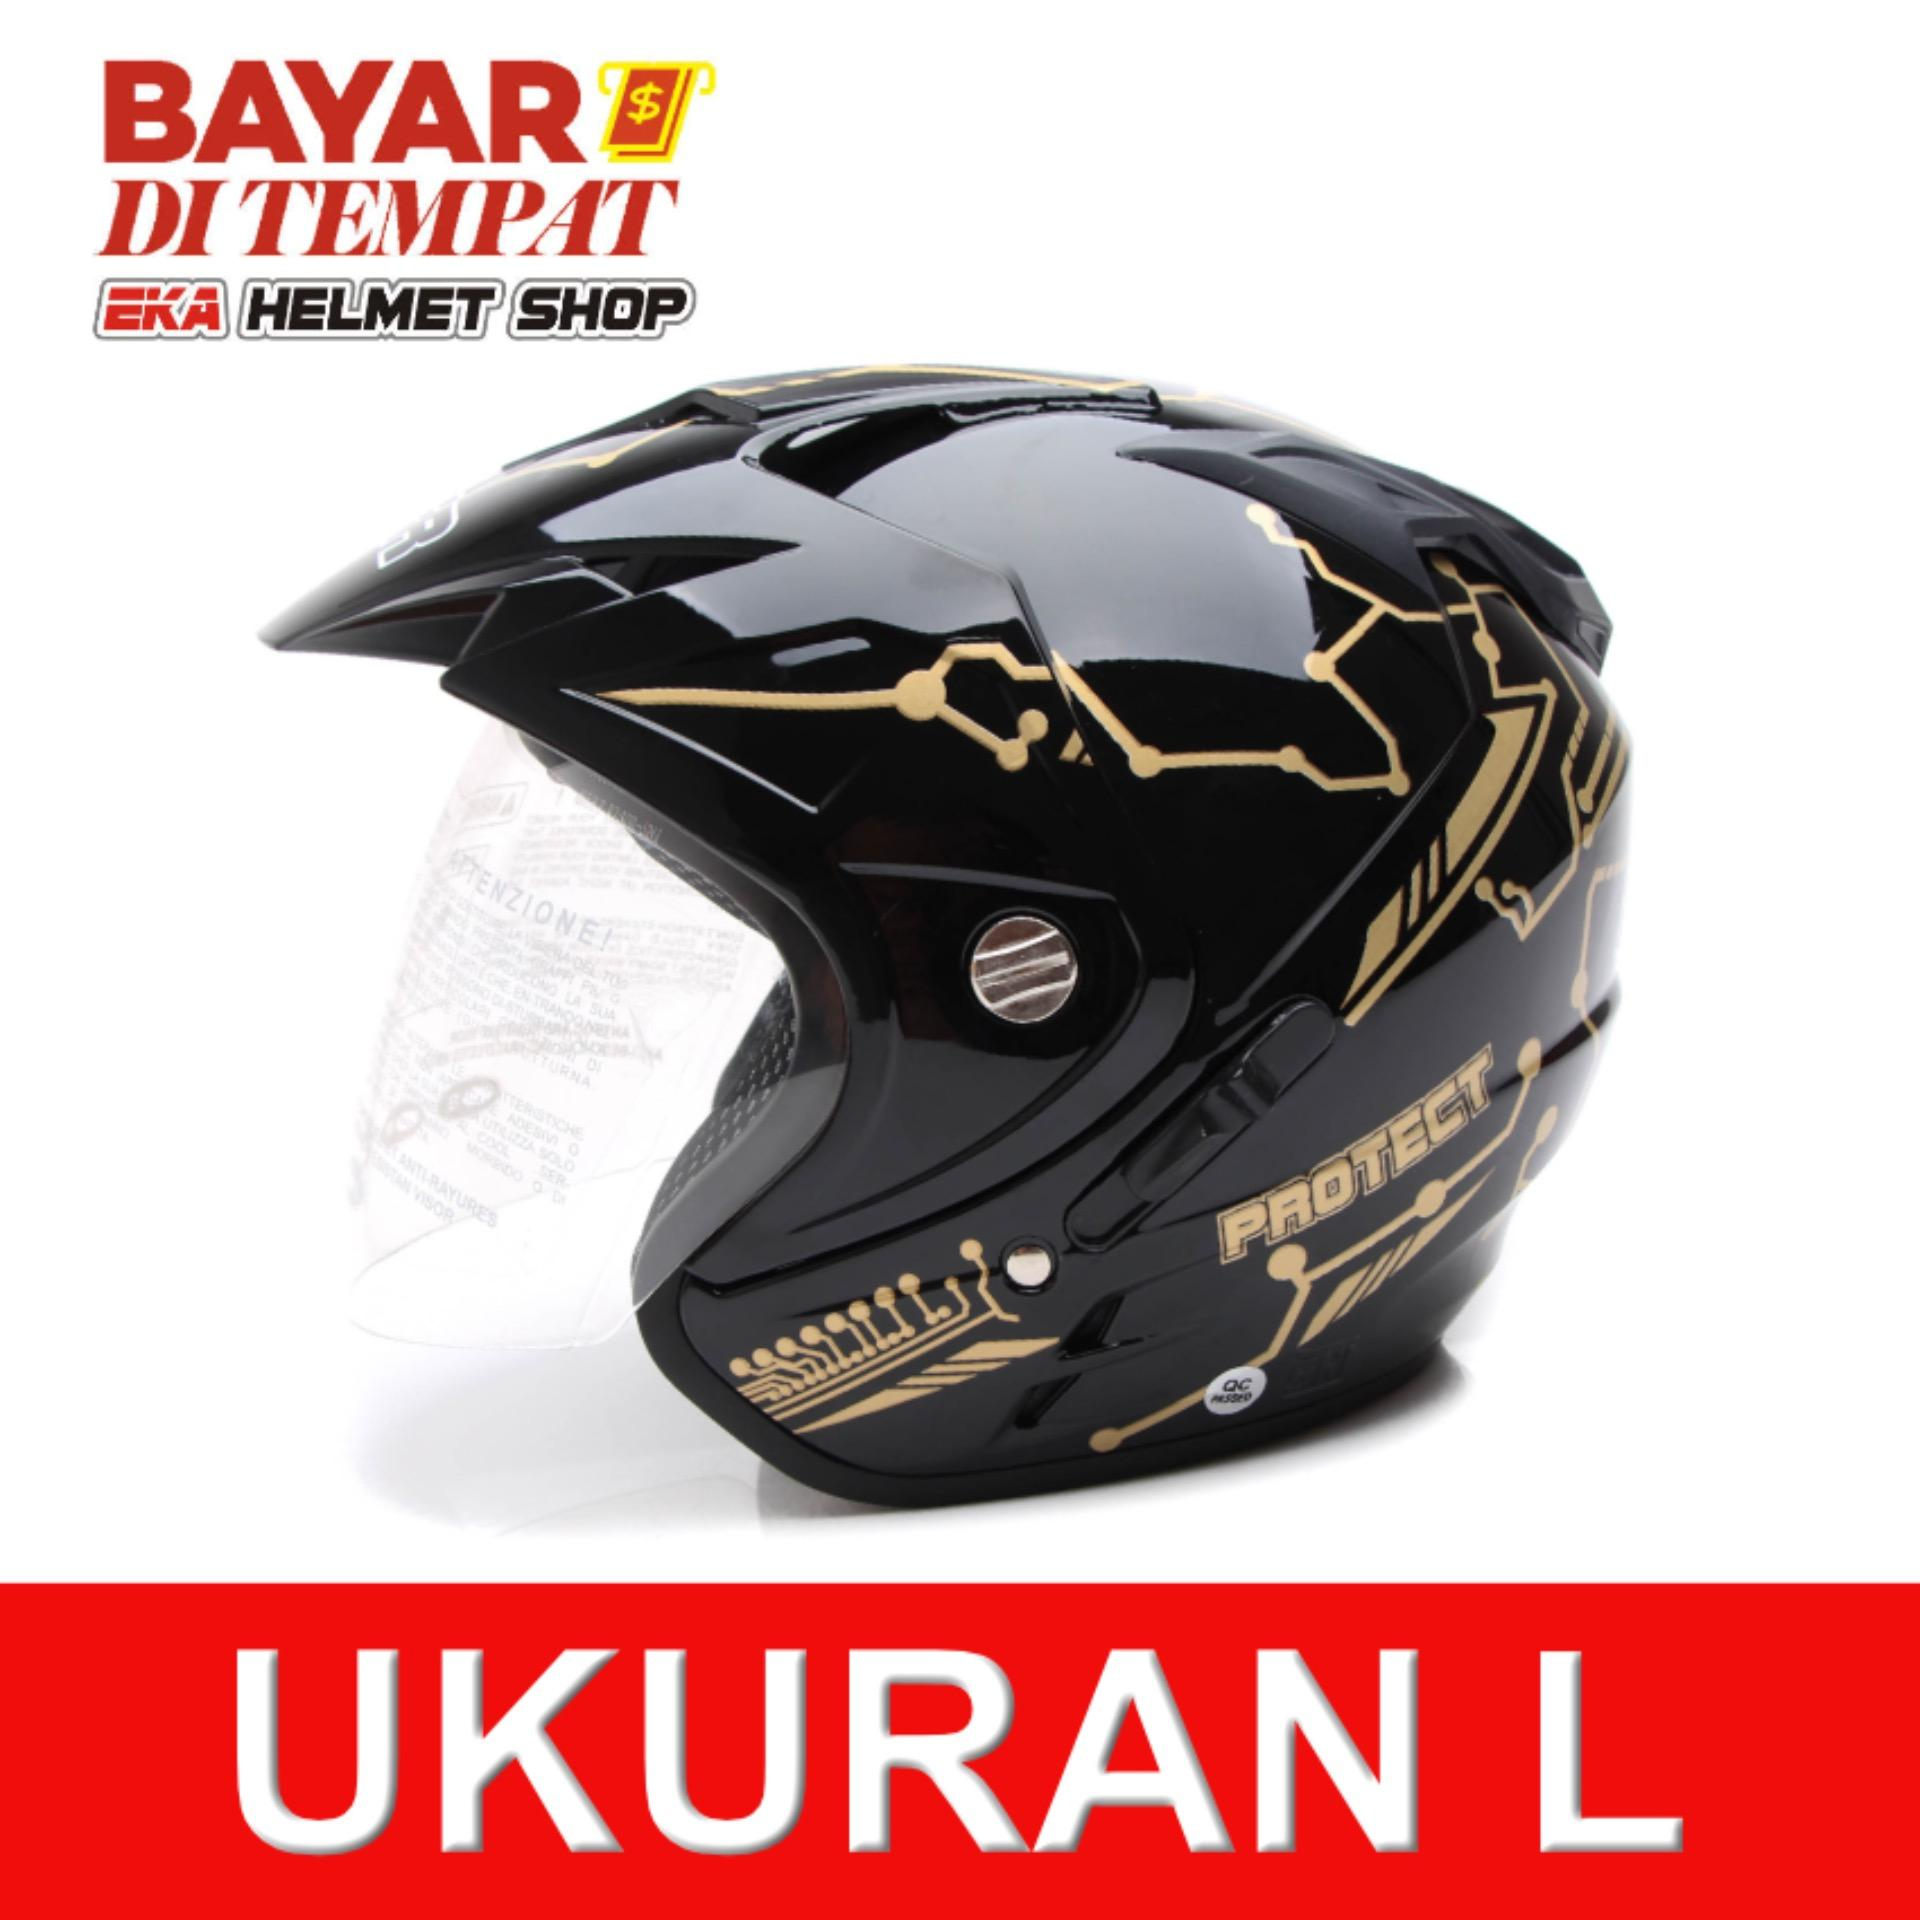 Harga Hemat Msr Helmet Impressive Protect Special Edition Double Visor Hitam Gold